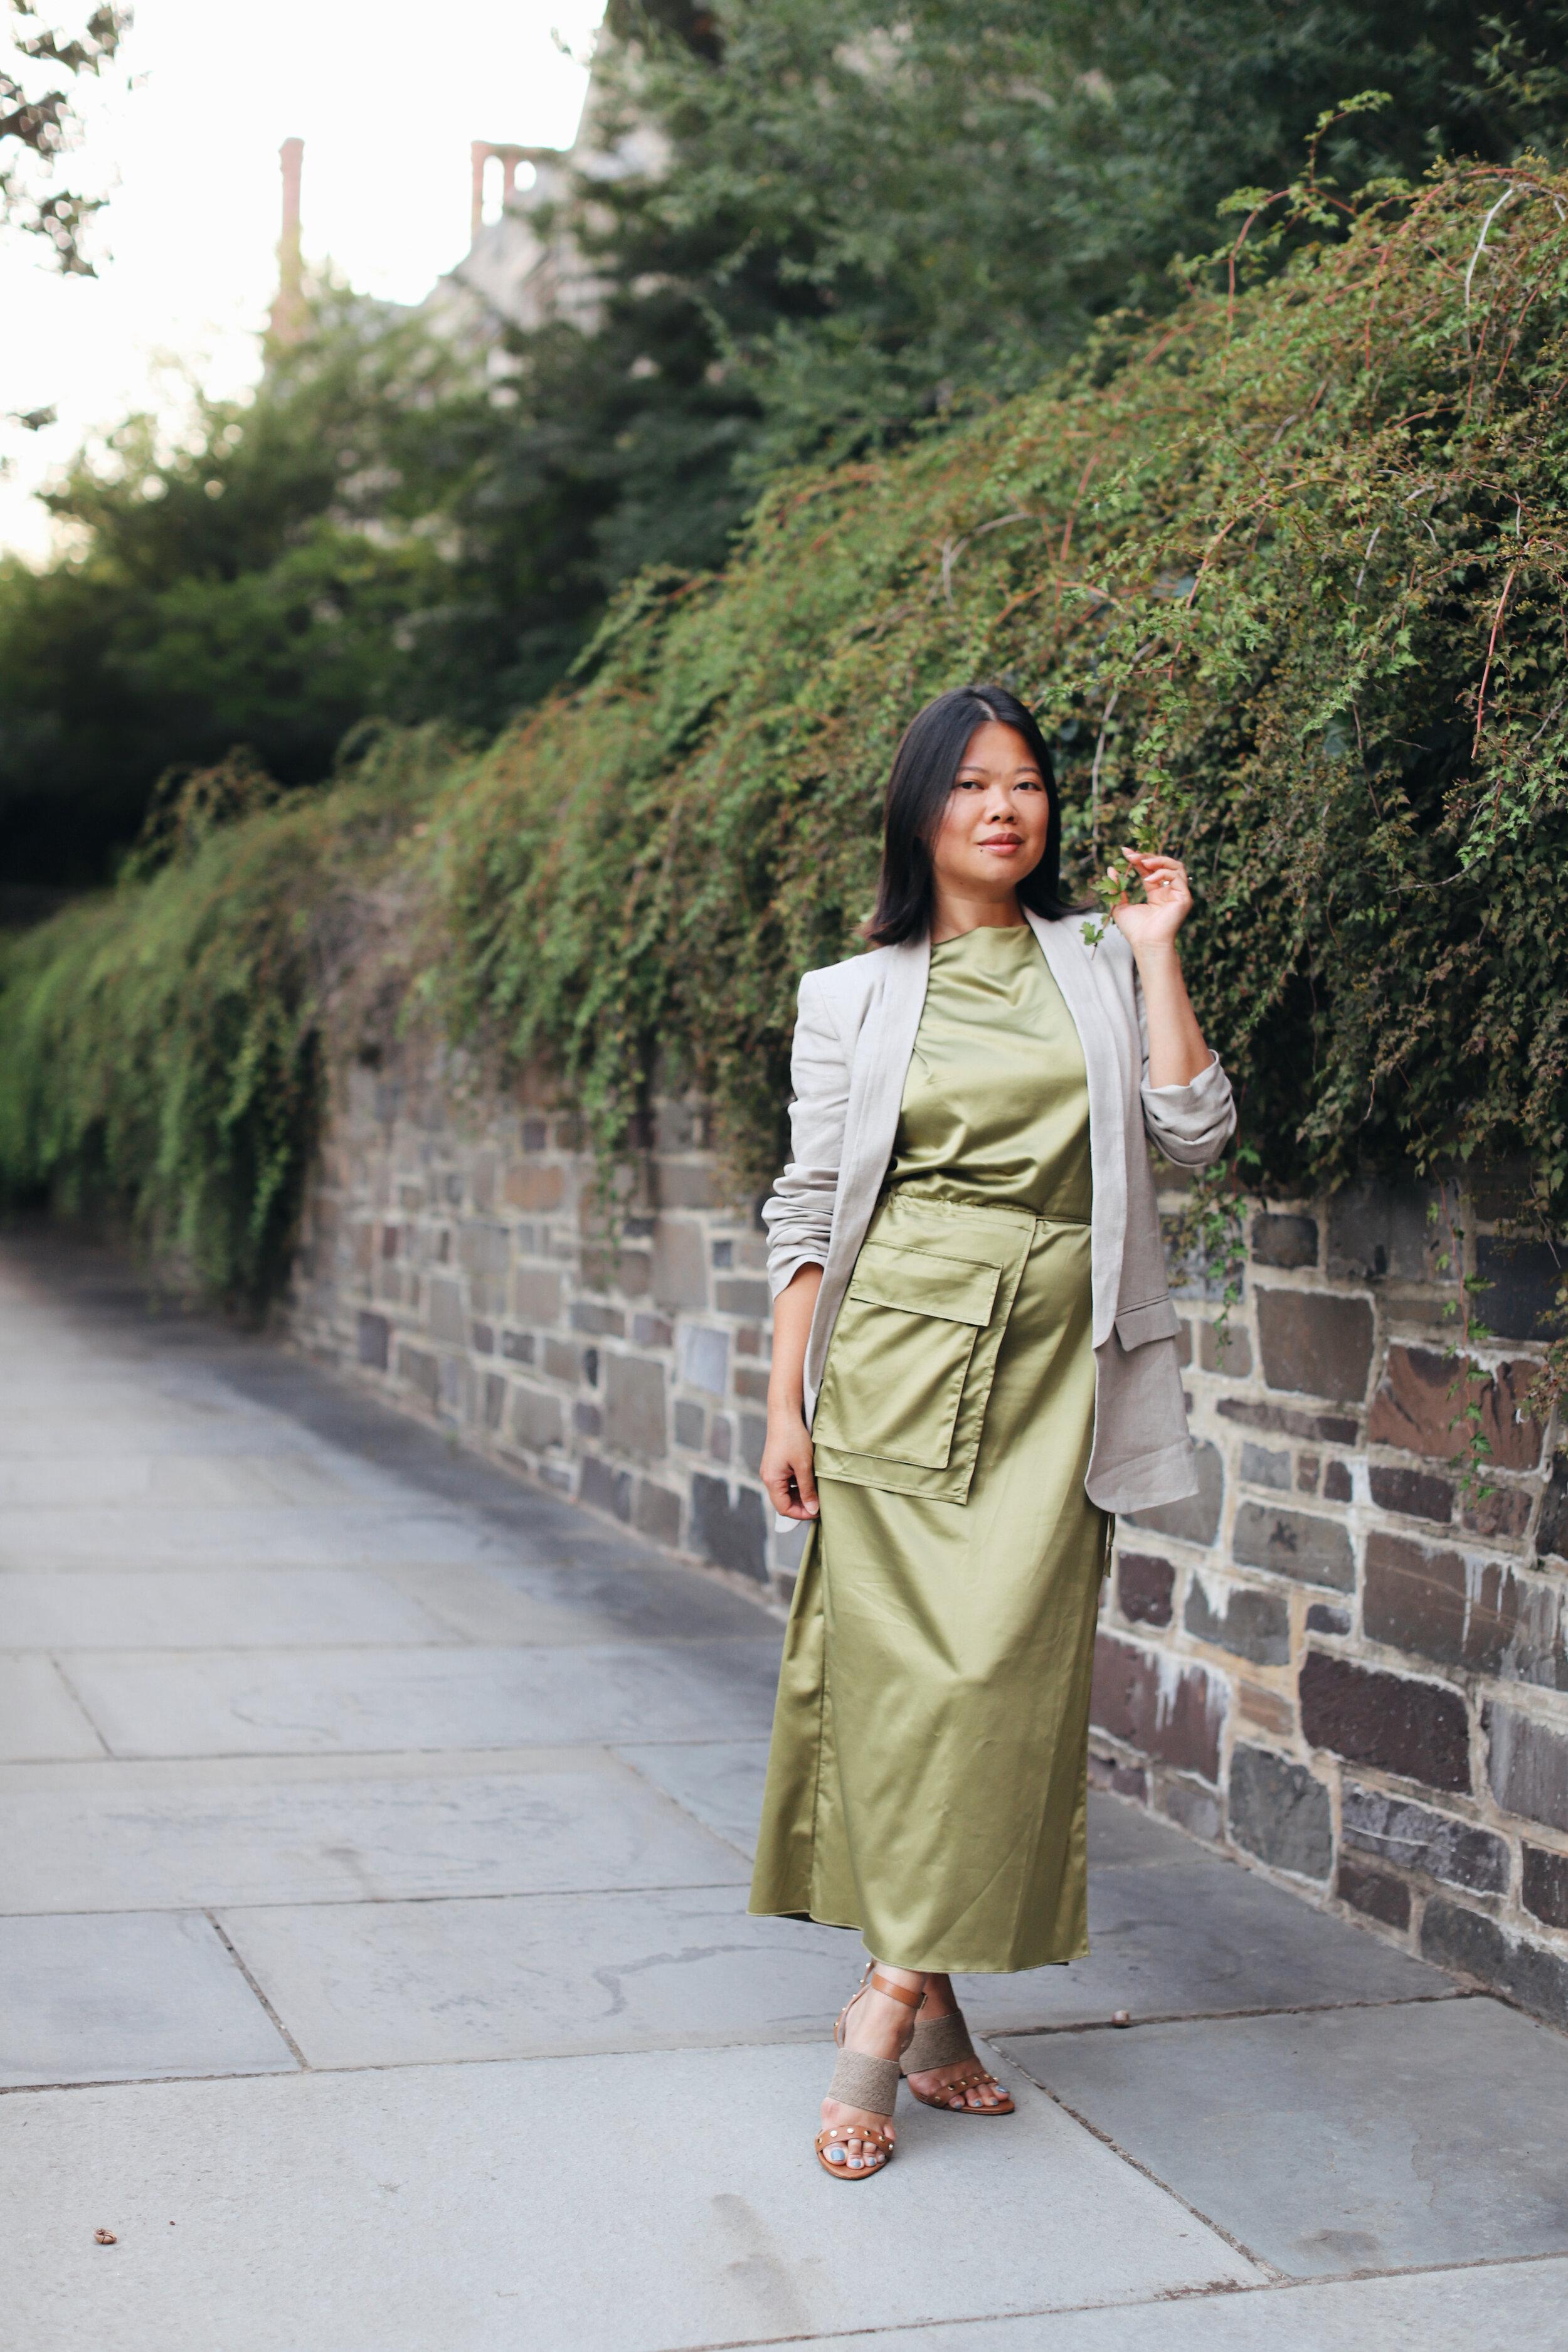 Wearing Zara linen blazer, Zara green utility dress, and Kinraden TO THE LAND ring.